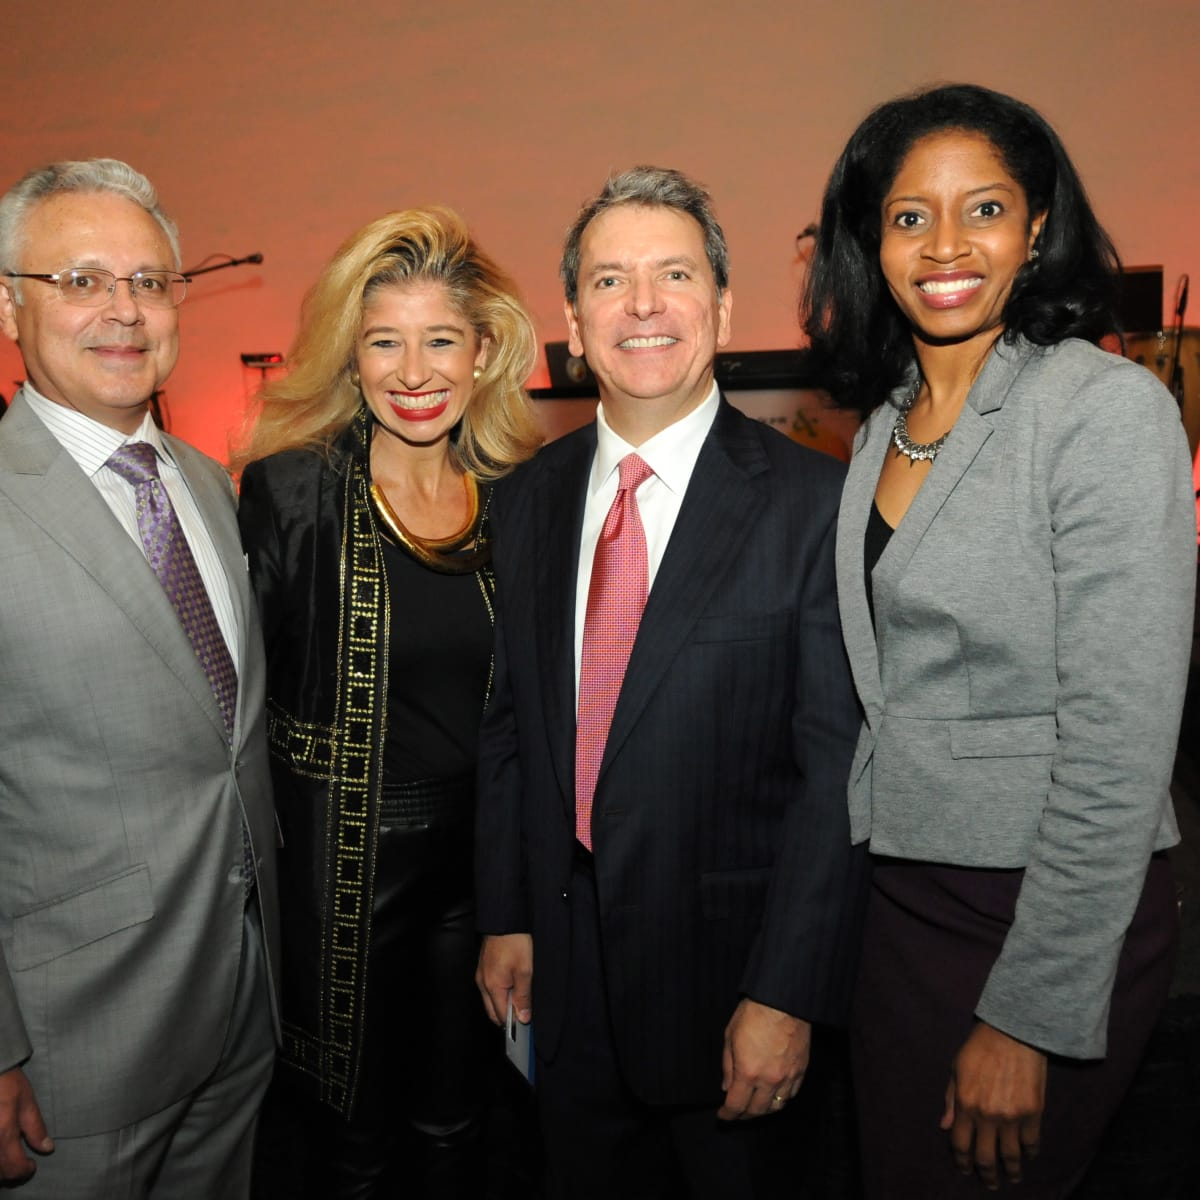 News, Shelby, Mayor's Hispanic Heritage Awards, Oct. 2015, David Medina, Sofia Adrogue, Roland Garcia, Shannon Bugs